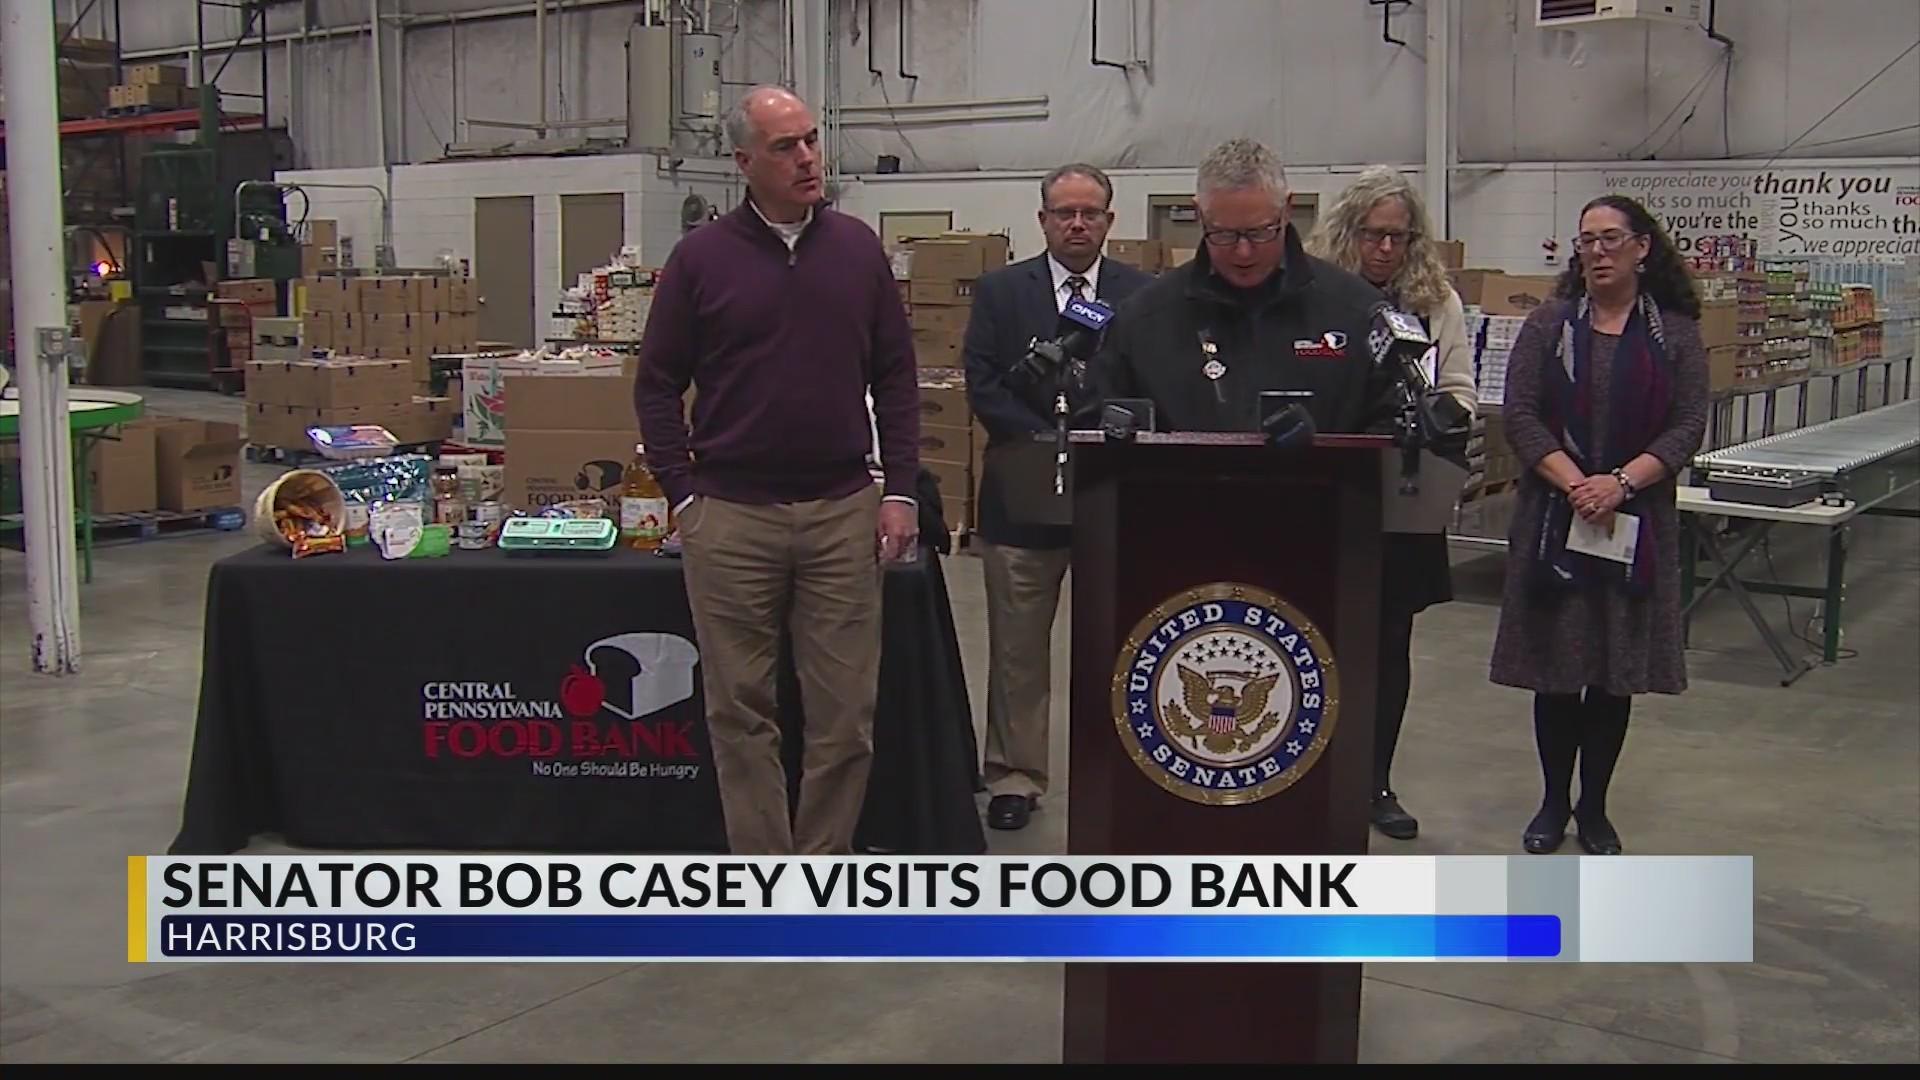 Senator_Bob_Casey_visits_food_bank_0_20190124181929